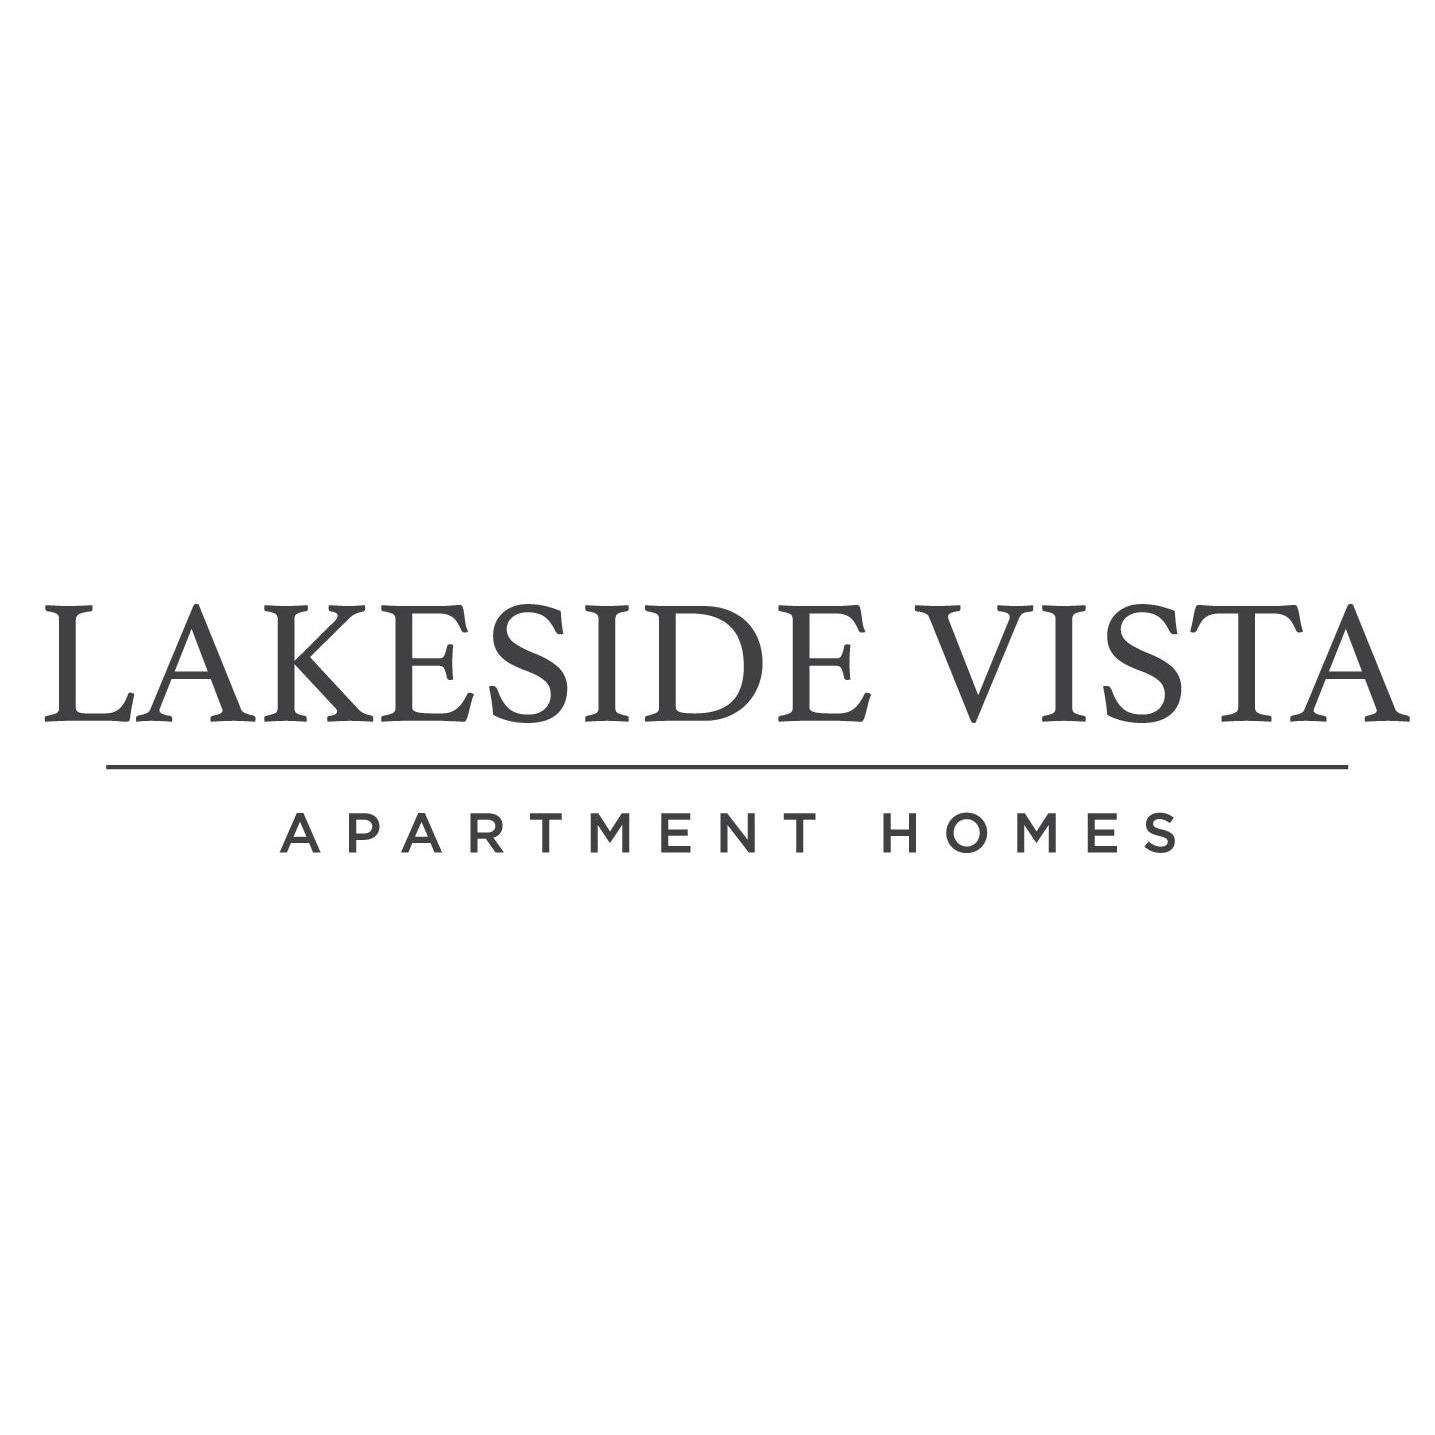 Lakeside Vista Apartments